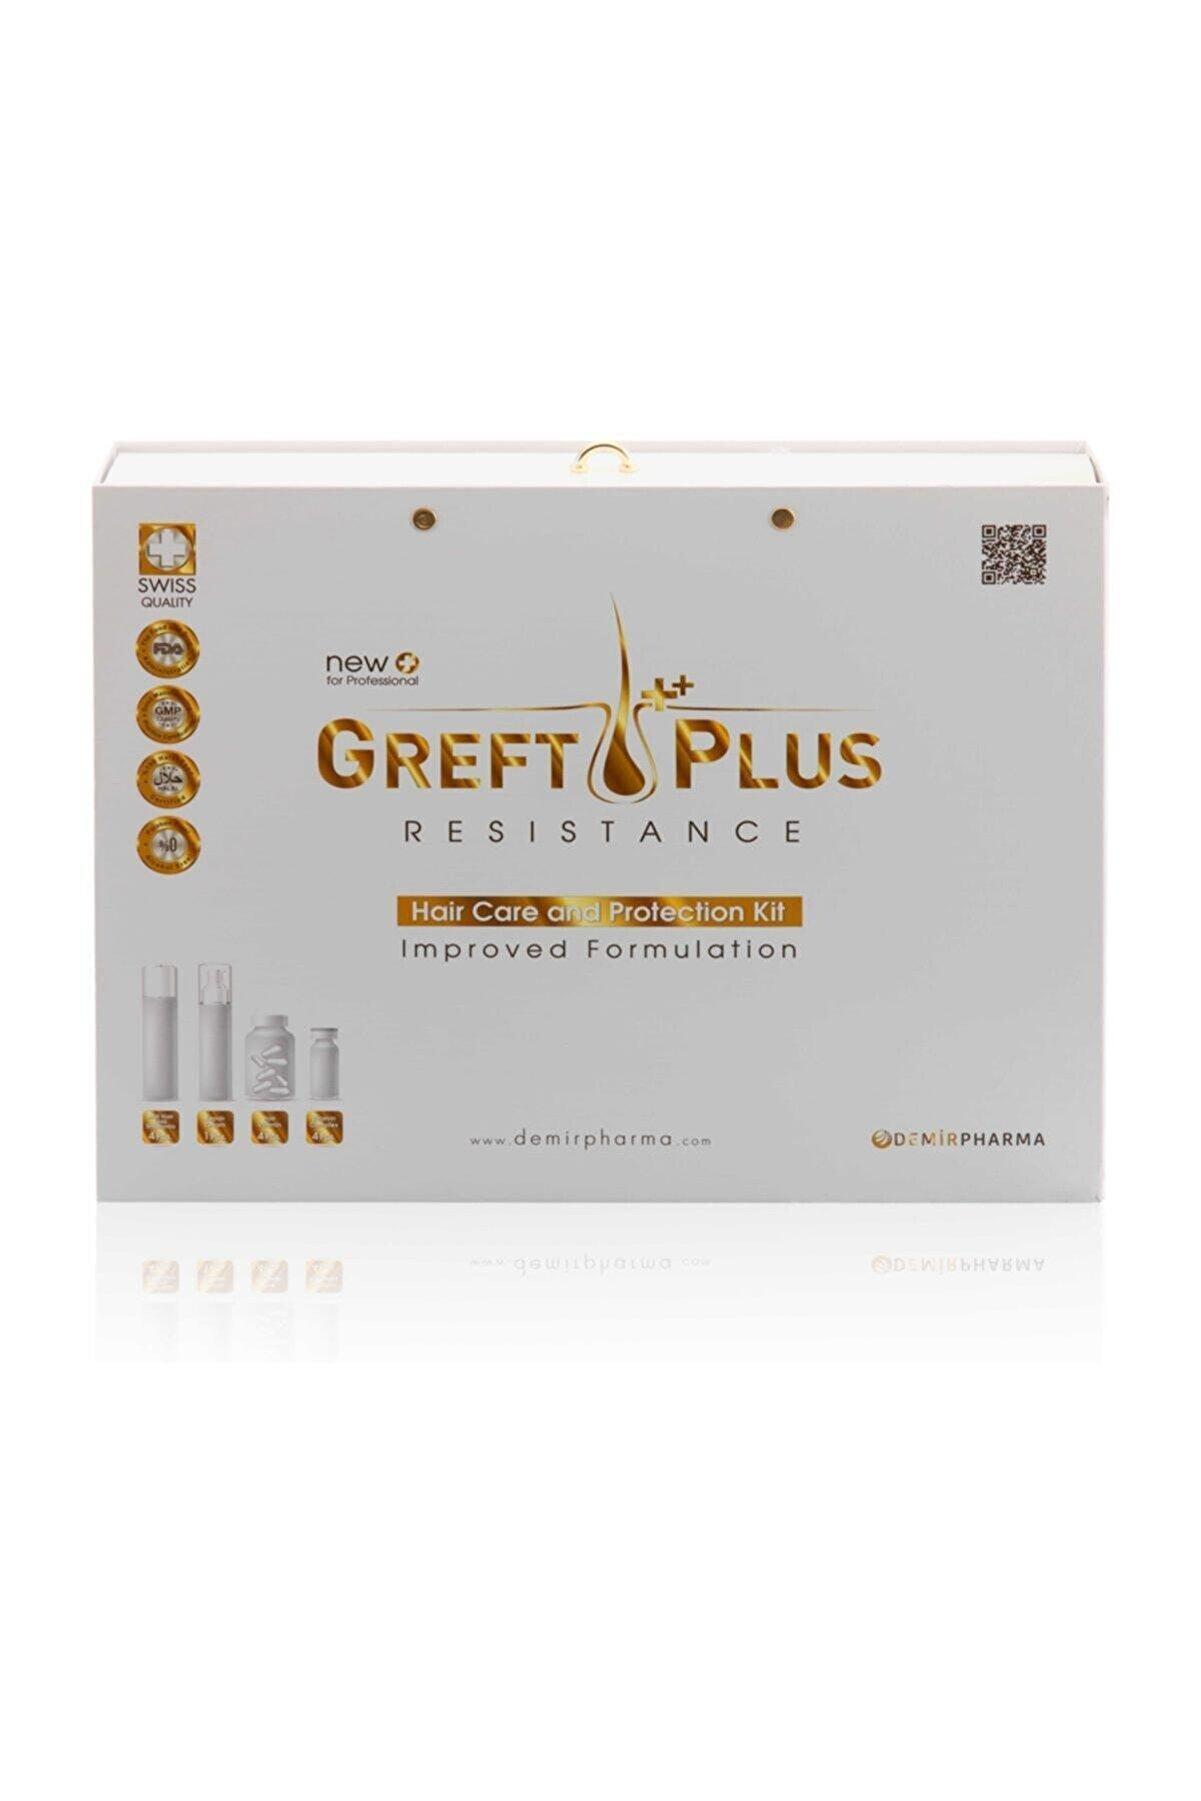 DEMİR PHARMA Greft Plus 6 Aylık Saç Bakım Seti Hair Care And Protection Kit